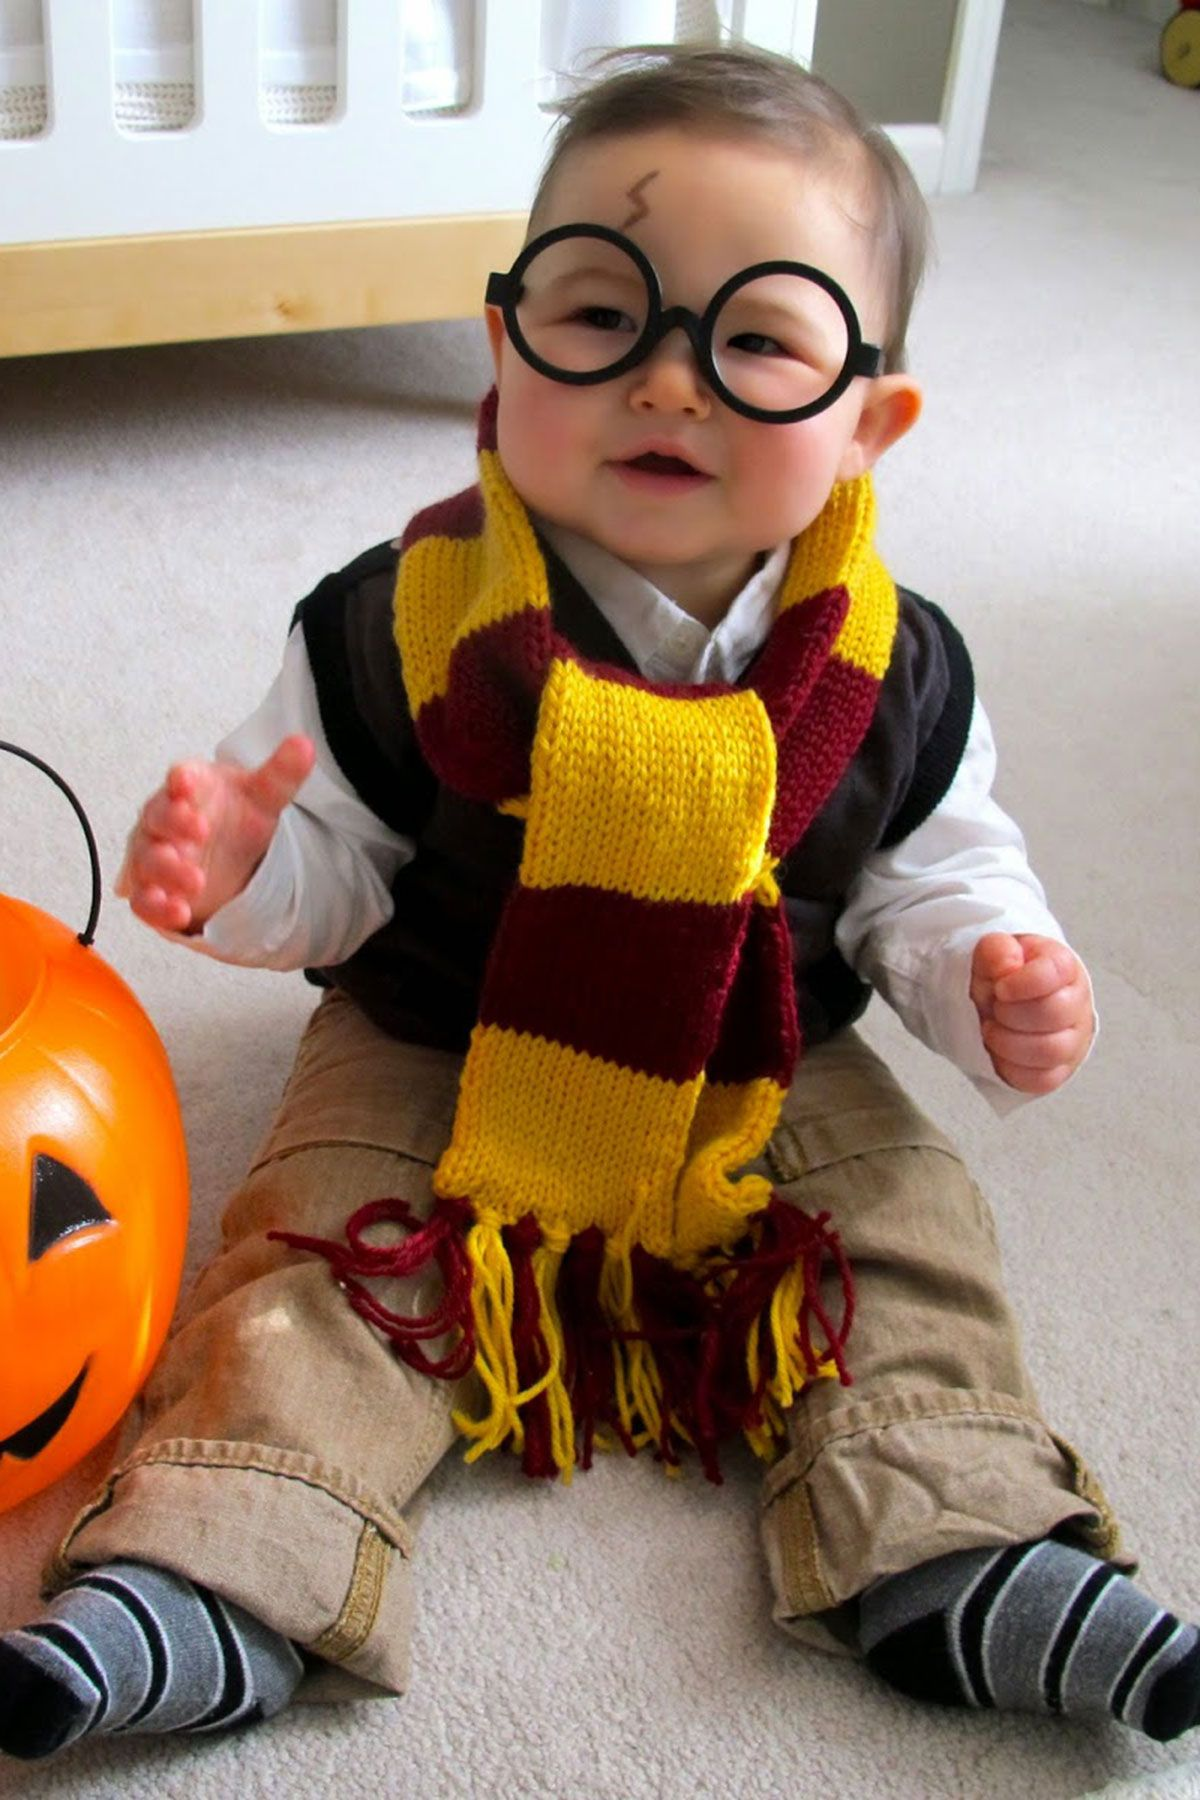 75+ homemade halloween costumes for kids - easy diy kids halloween